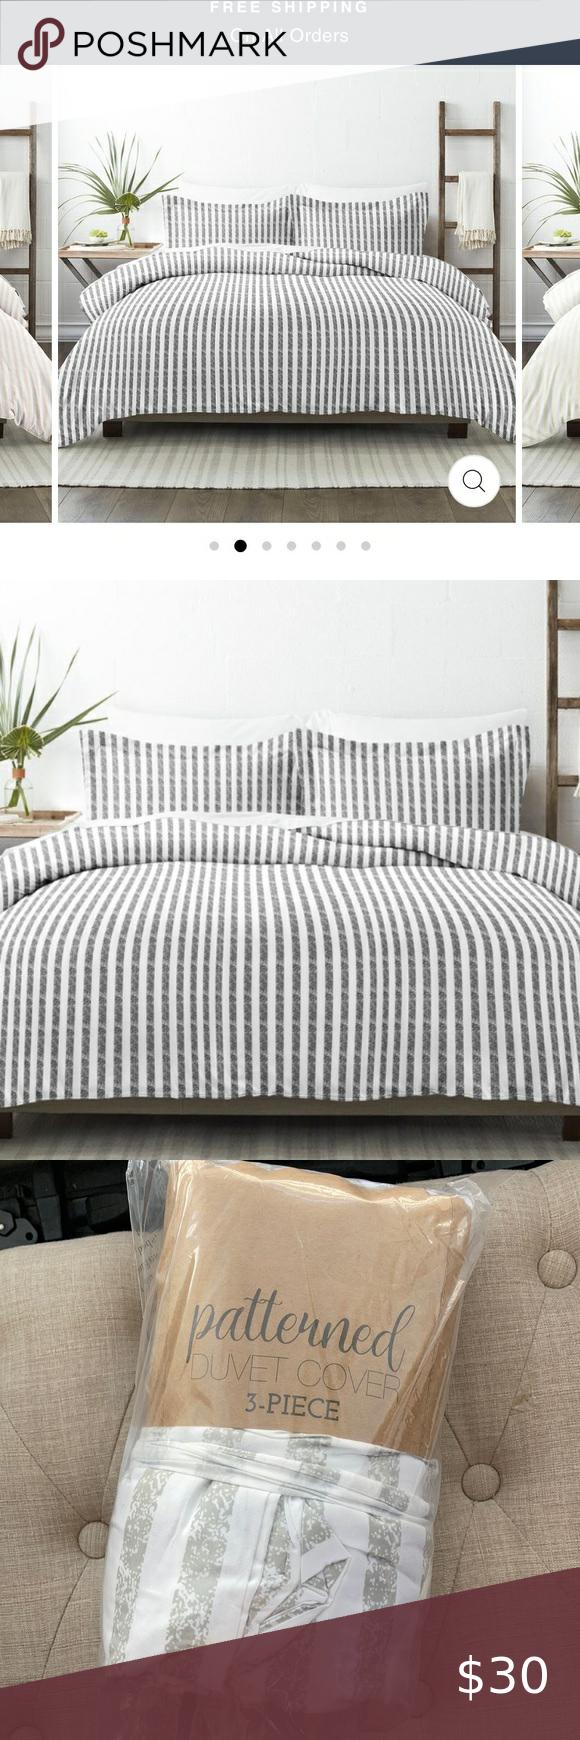 Gray Striped Duvet Cover Full Sized In 2020 Striped Duvet Covers Full Duvet Cover Striped Duvet